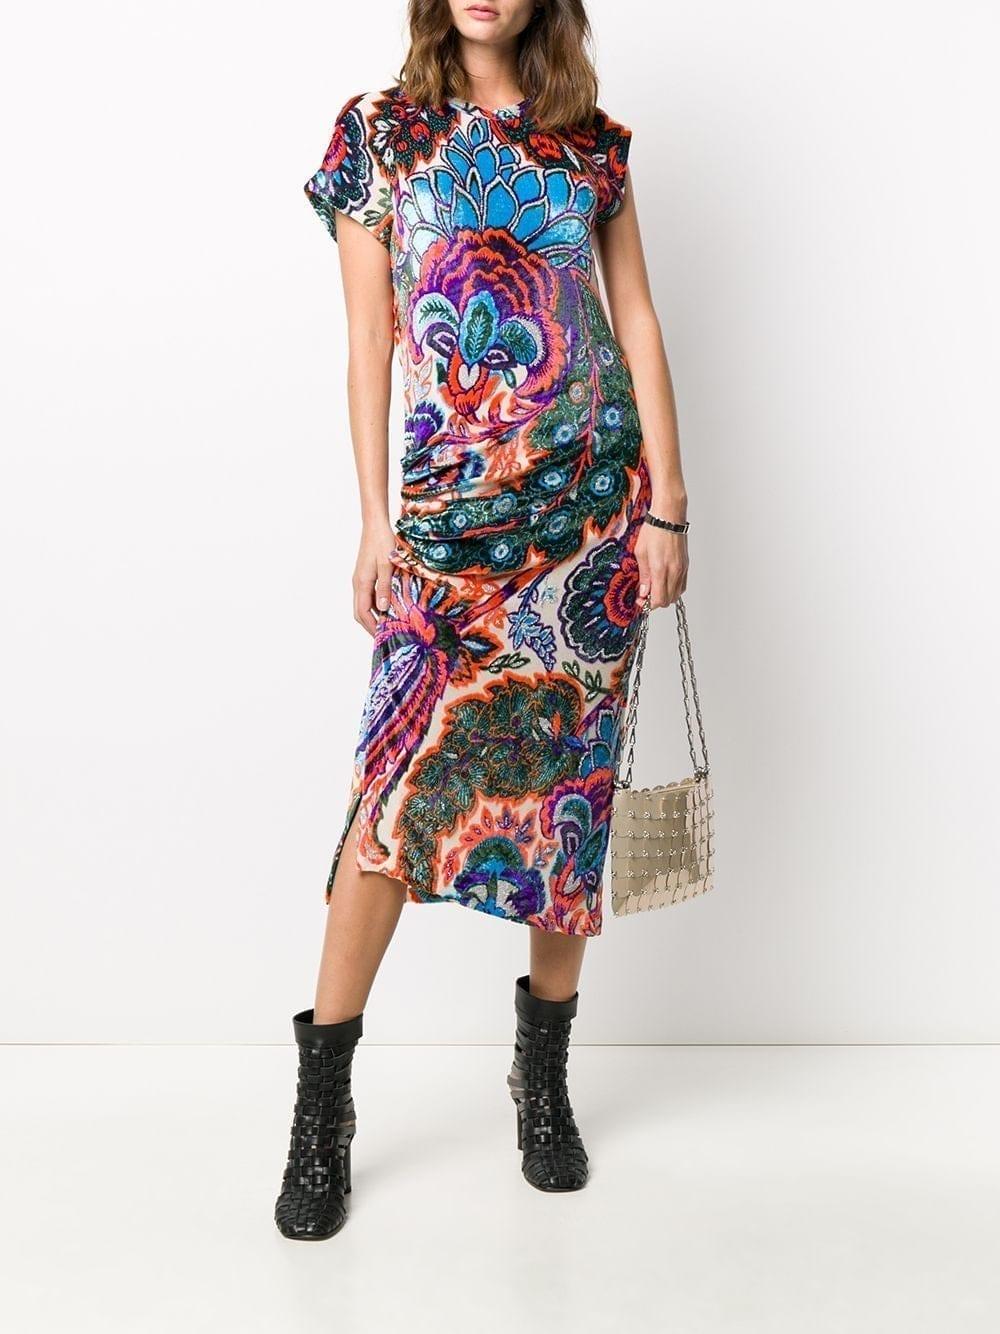 PACO RABANNE Floral Print Draped Dress